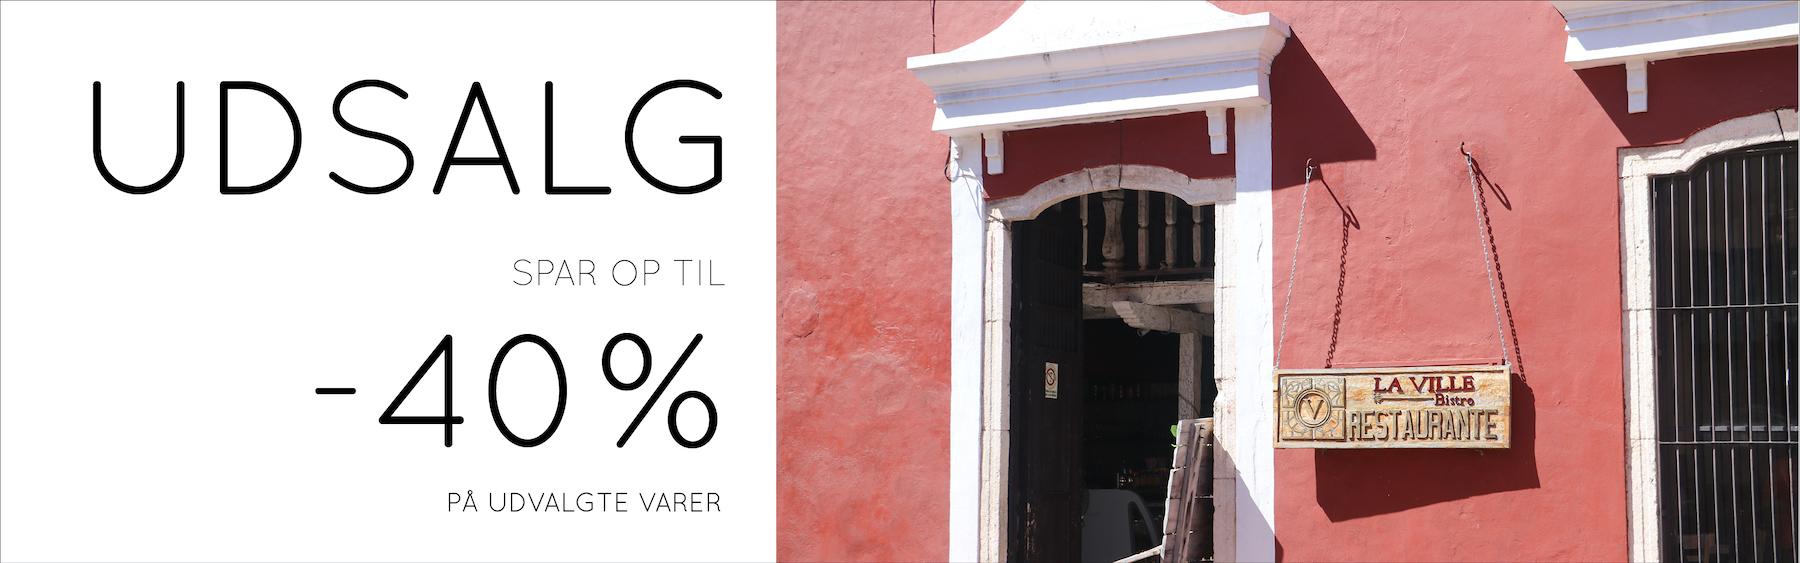 Manipura Living UDSALG OP TIL 40%_ 1200x200